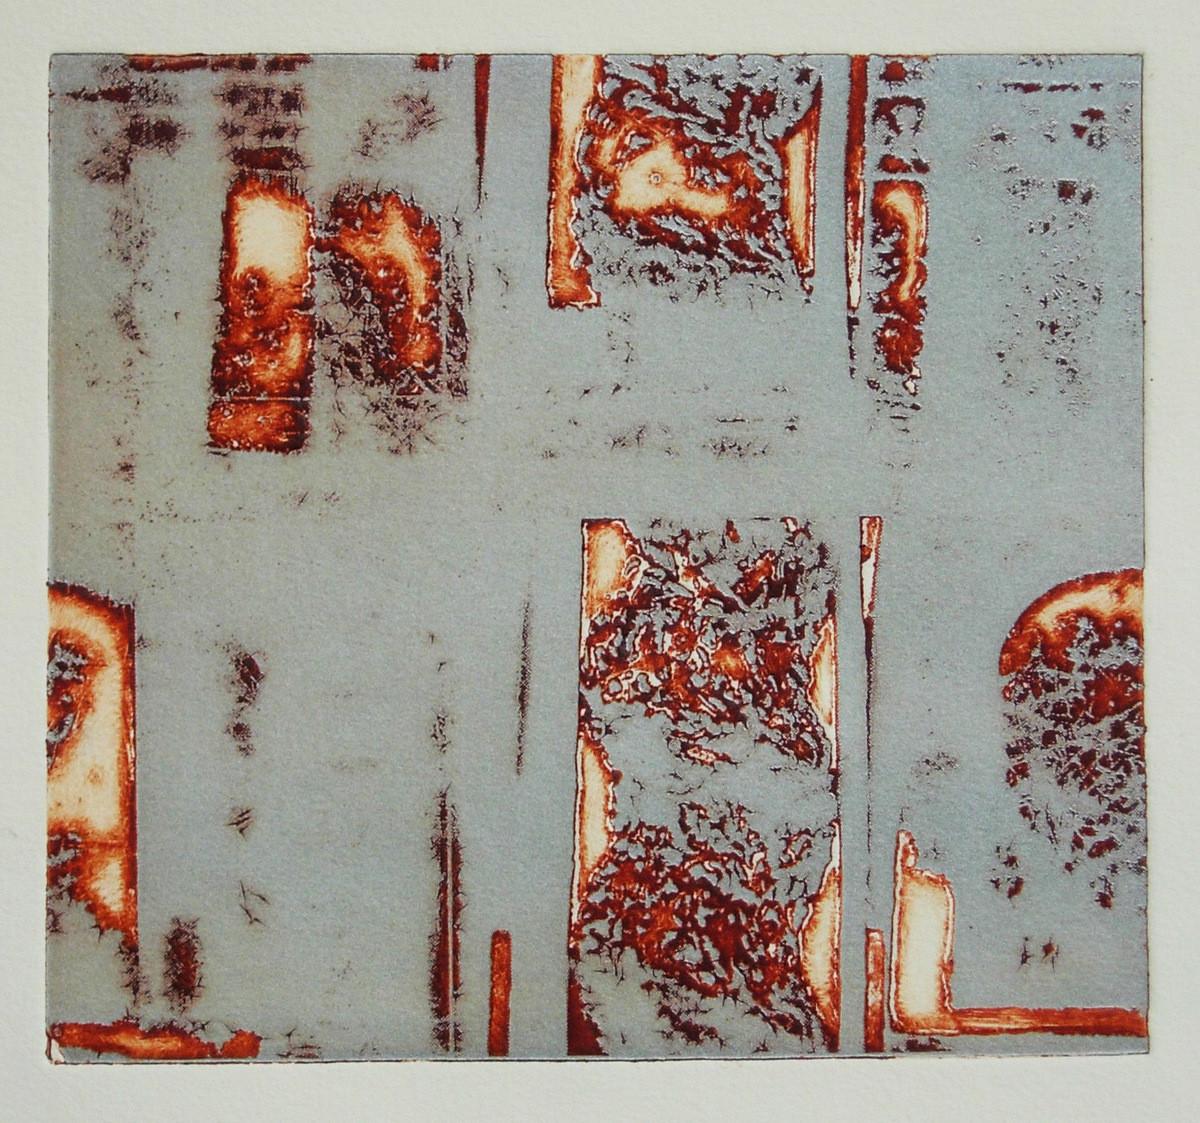 Técnica: fotopolímero Papel Fabriano Rusticus 280 gr. Medidas 20'5x18'5cm